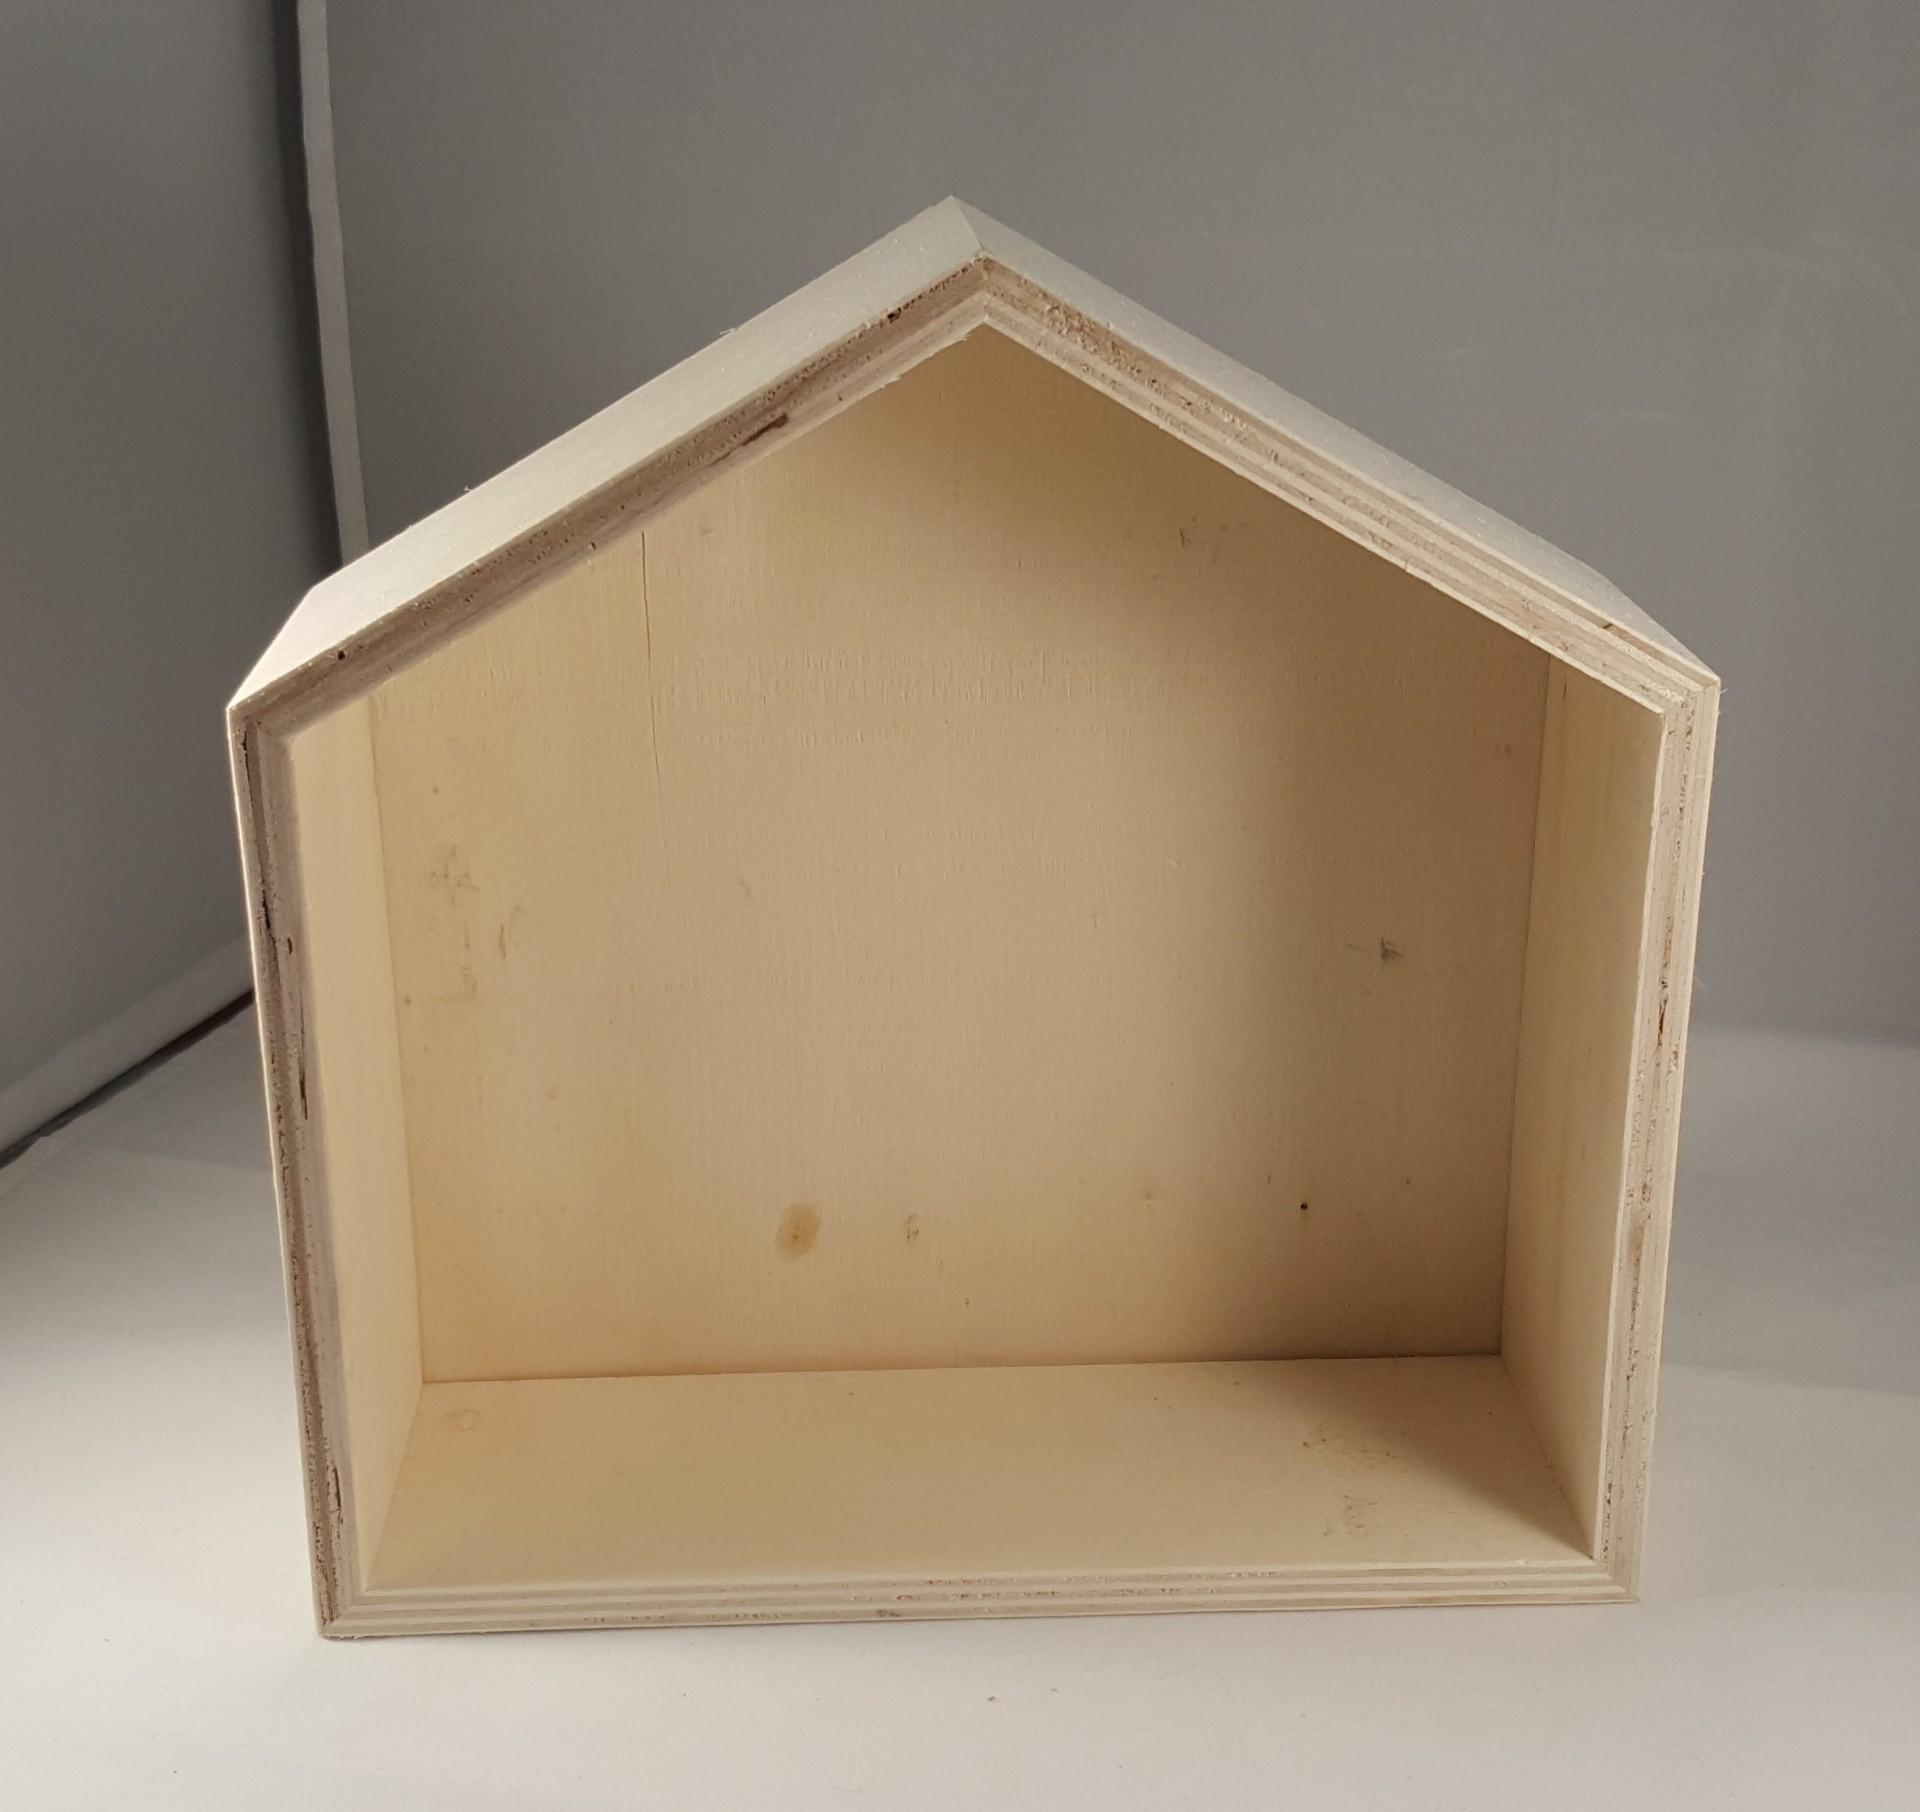 Moldura Caixa casa sem vidro